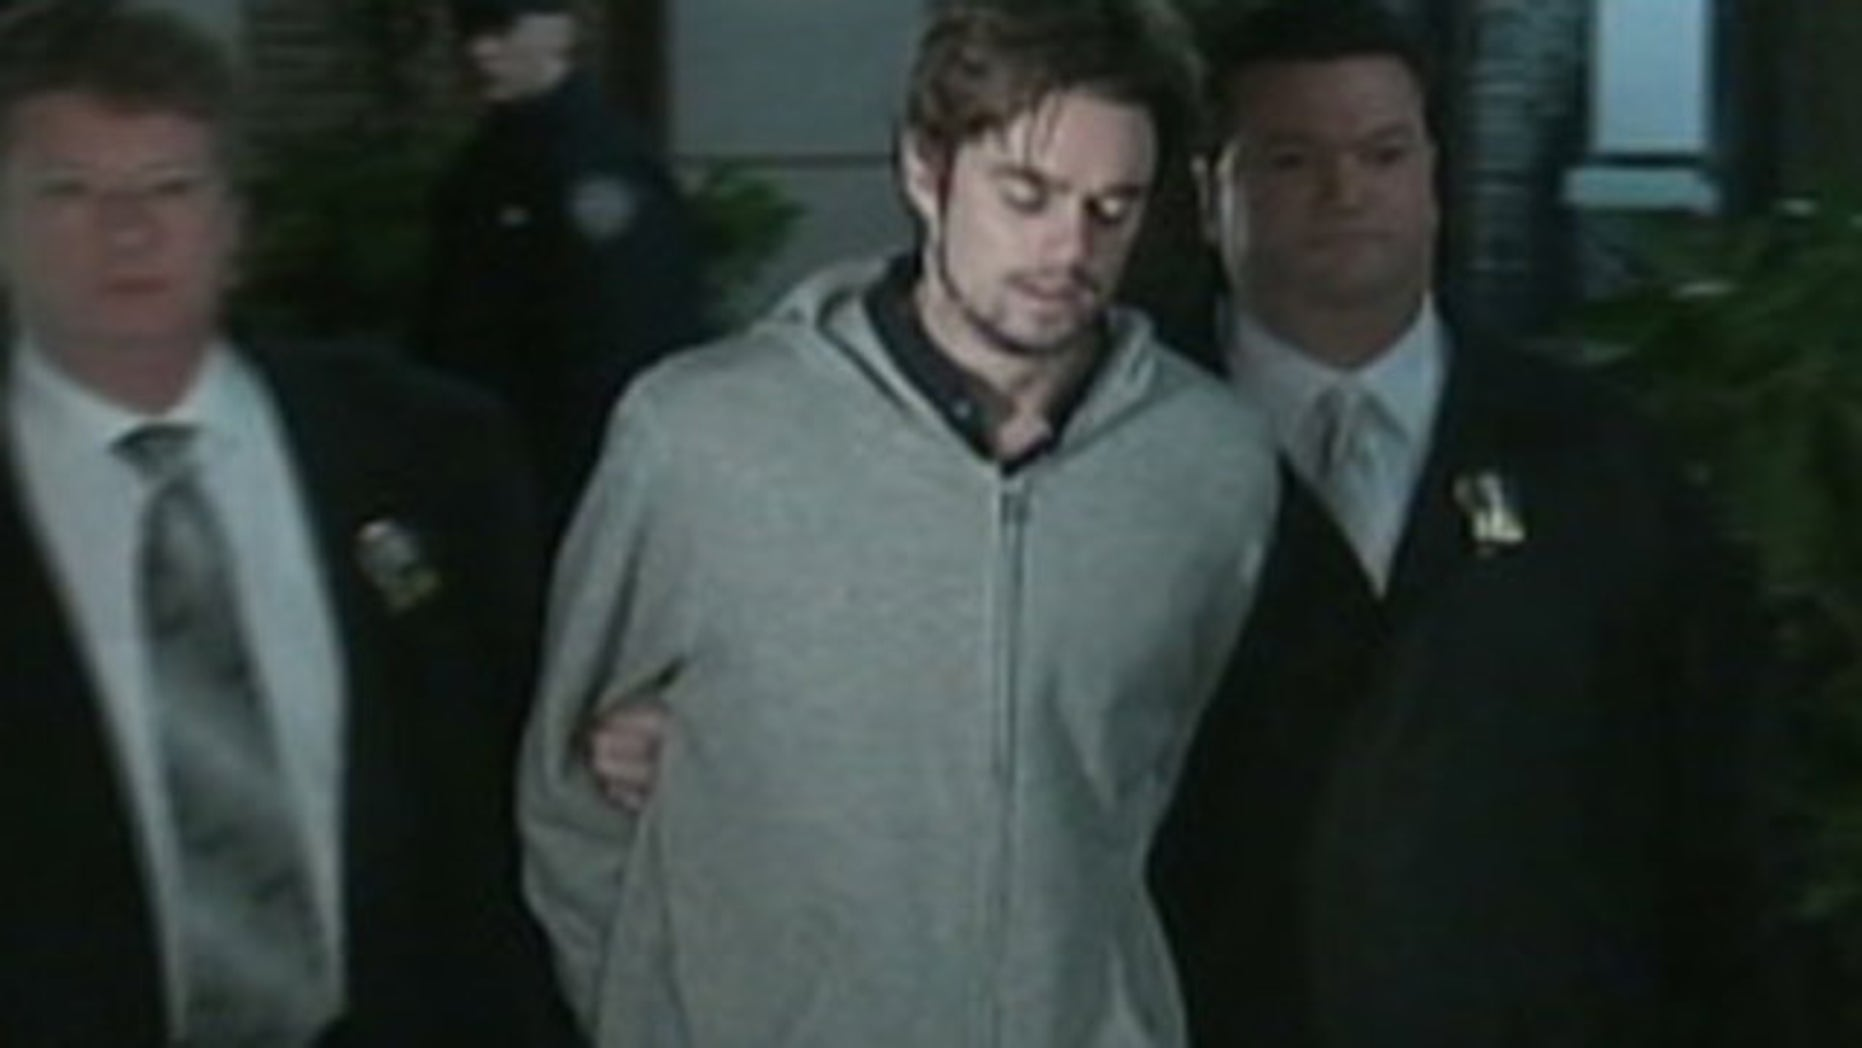 Dec. 10: New York authorities arrest Nicholas Brooks in the murder of Sylvie Cachay.